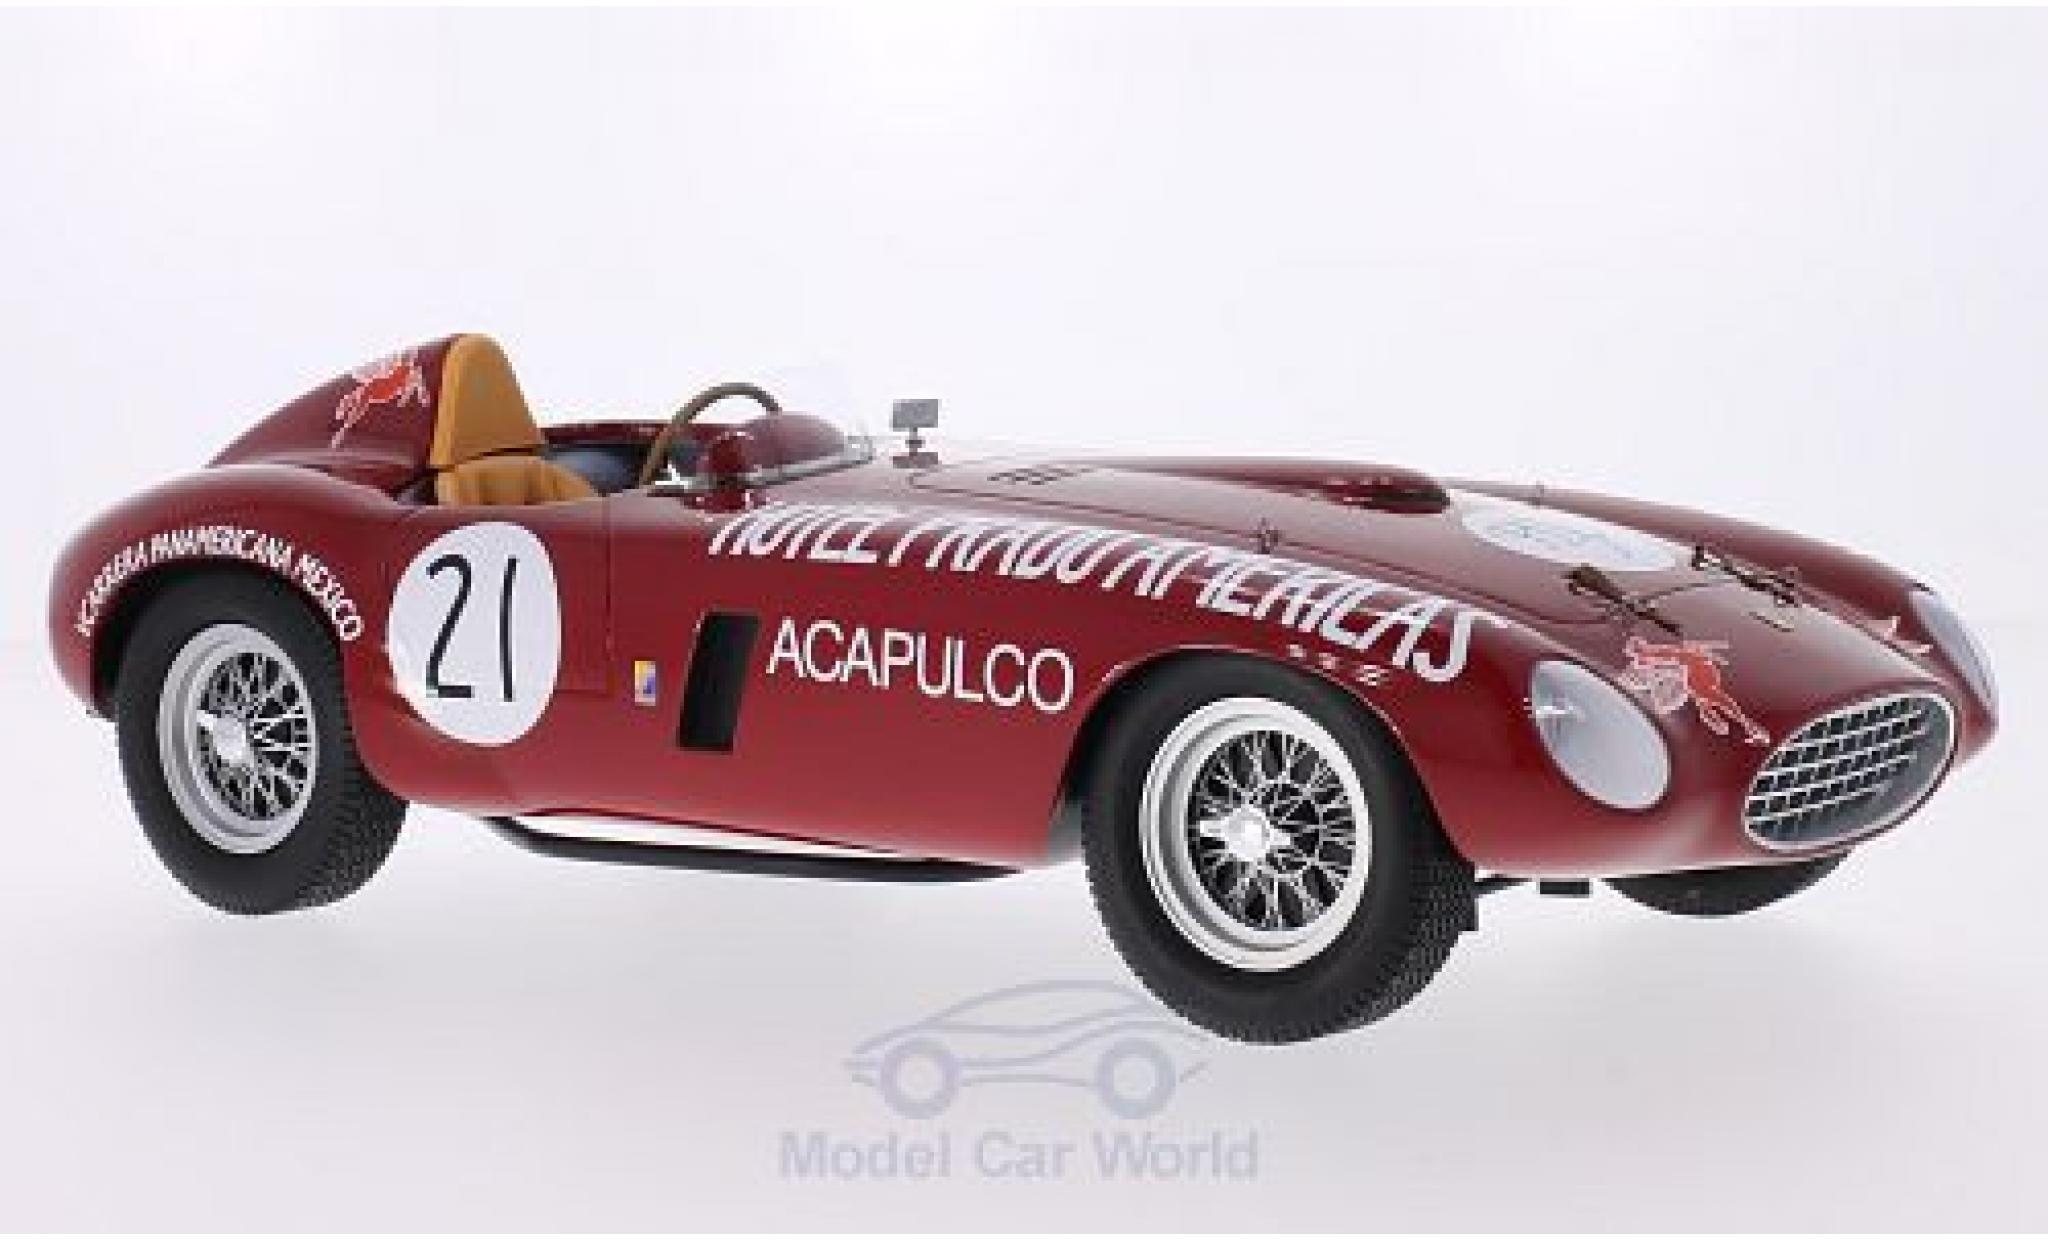 Ferrari 250 1/12 CMF Monza No.21 Hotel Prado Americas Carrera Panamericana